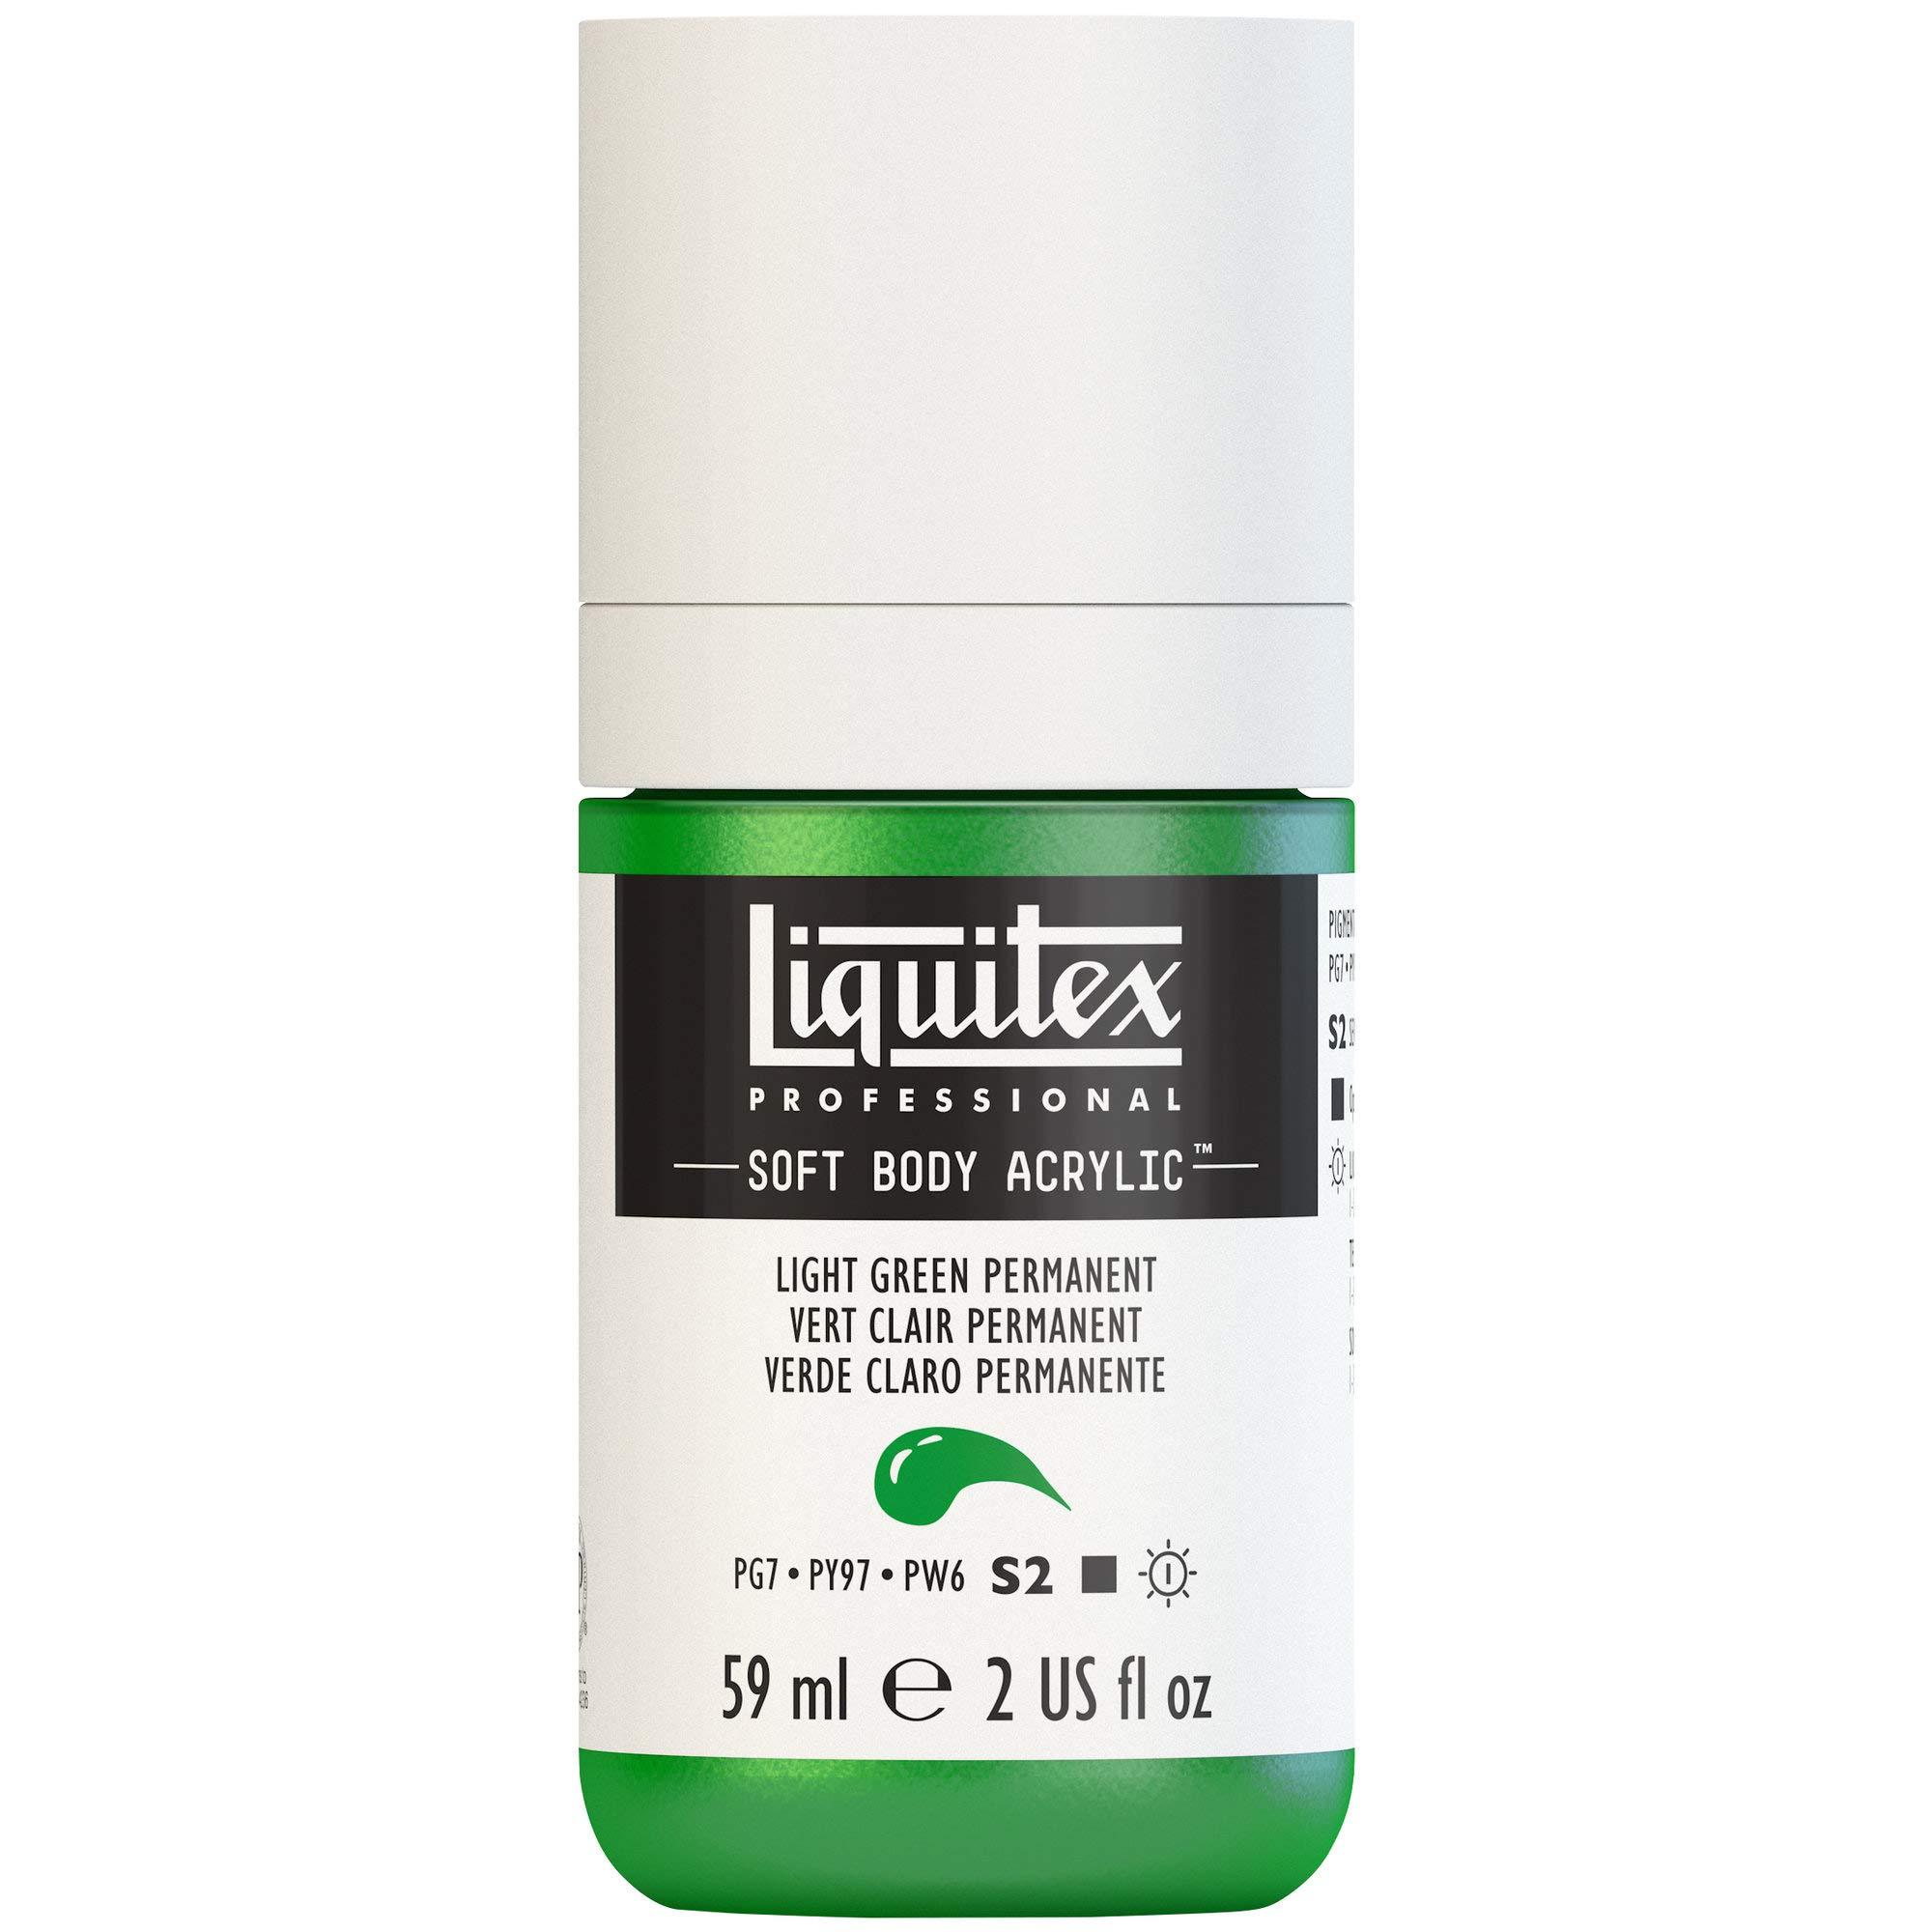 Liquitex Professional Soft Body Acrylic Paint 2-oz bottle, Light Green Permanent